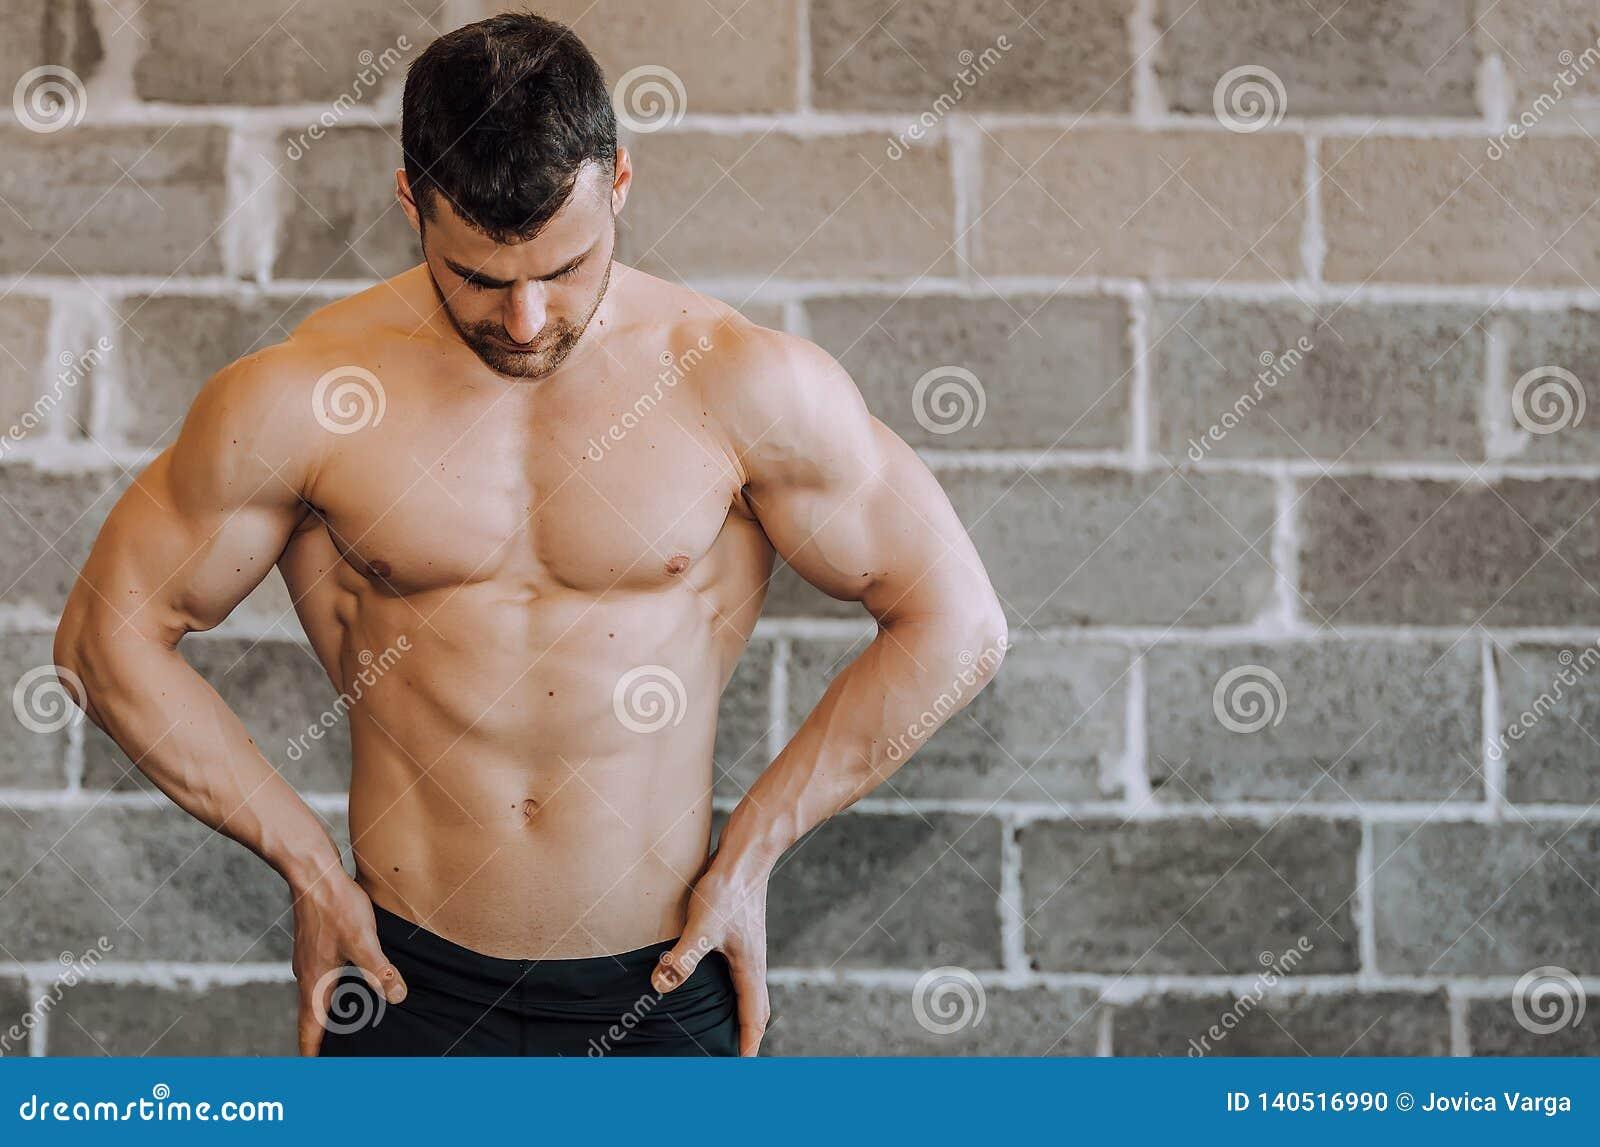 Без рубашки мышечный культурист на спортзале